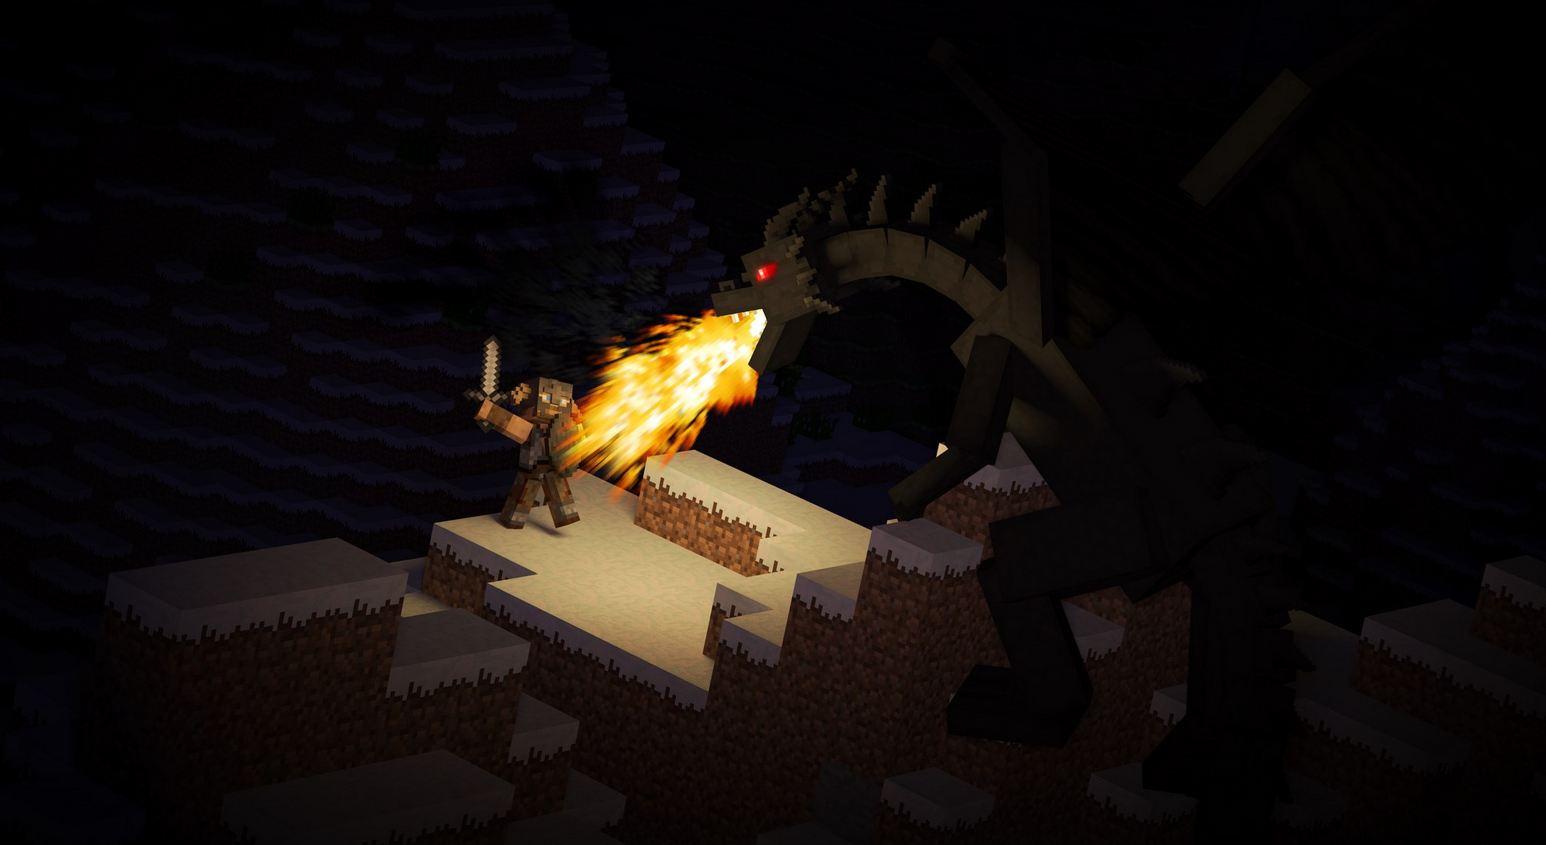 Fond d'ecran minecraft ender dragon en plein combat